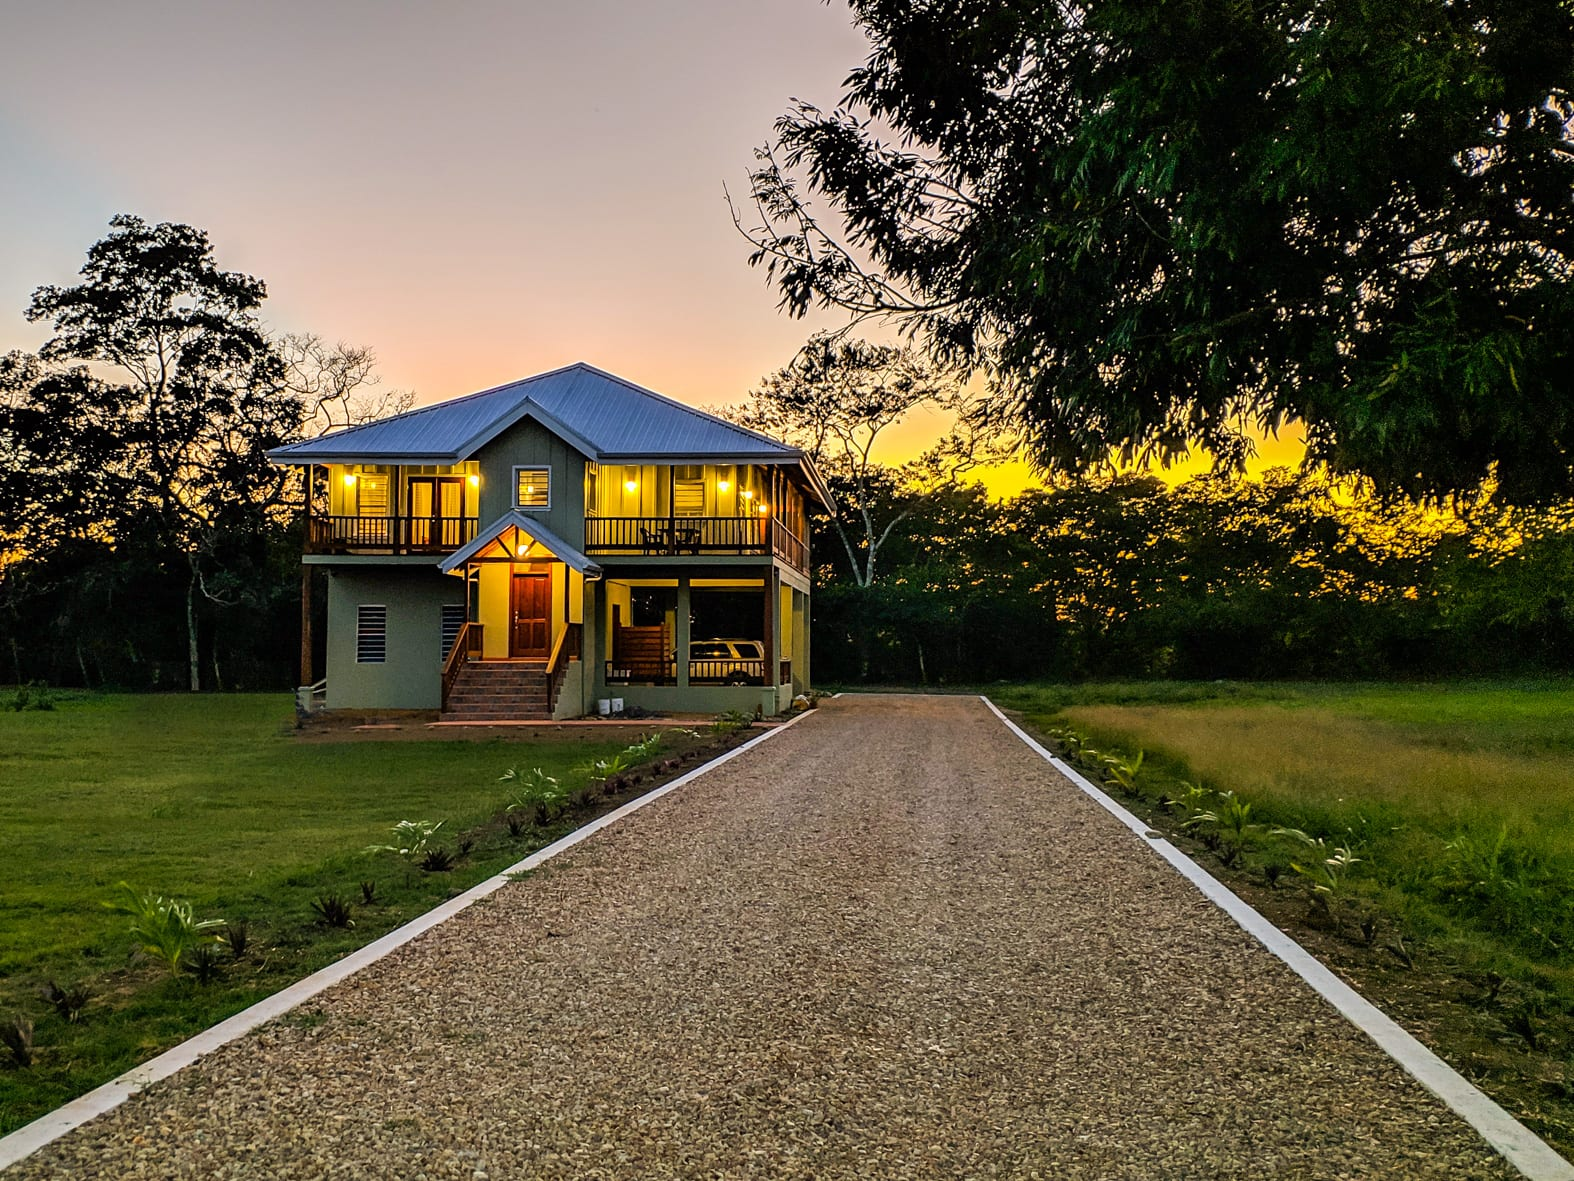 Carmelita gardens retire belize sunset